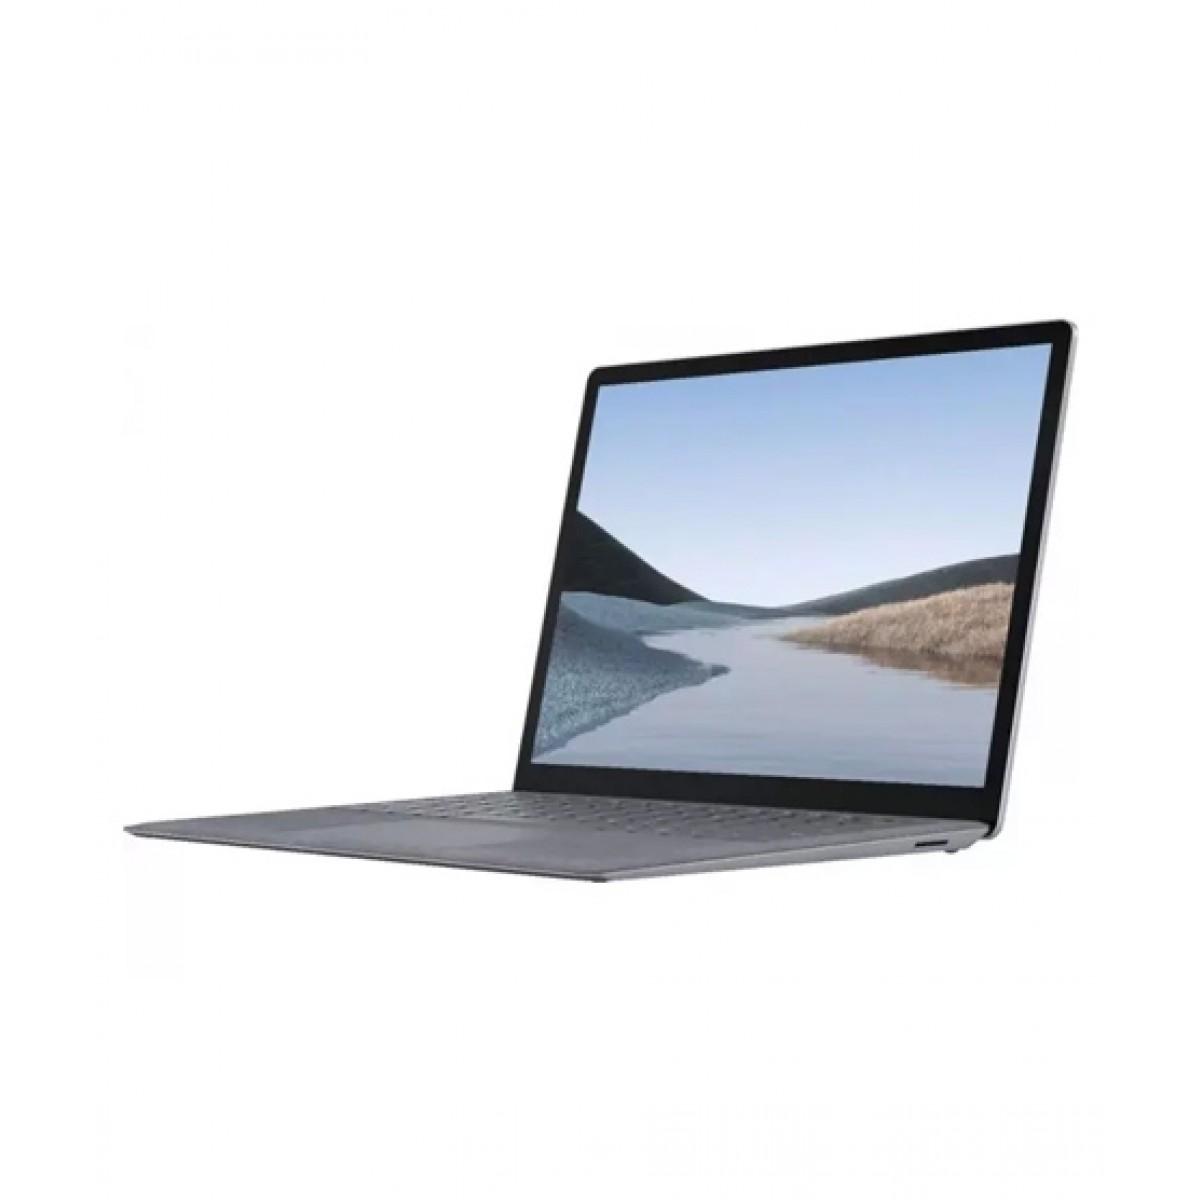 Microsoft Surface Laptop 3 10th Gen Core i5 8GB 128GB SSD Platinum